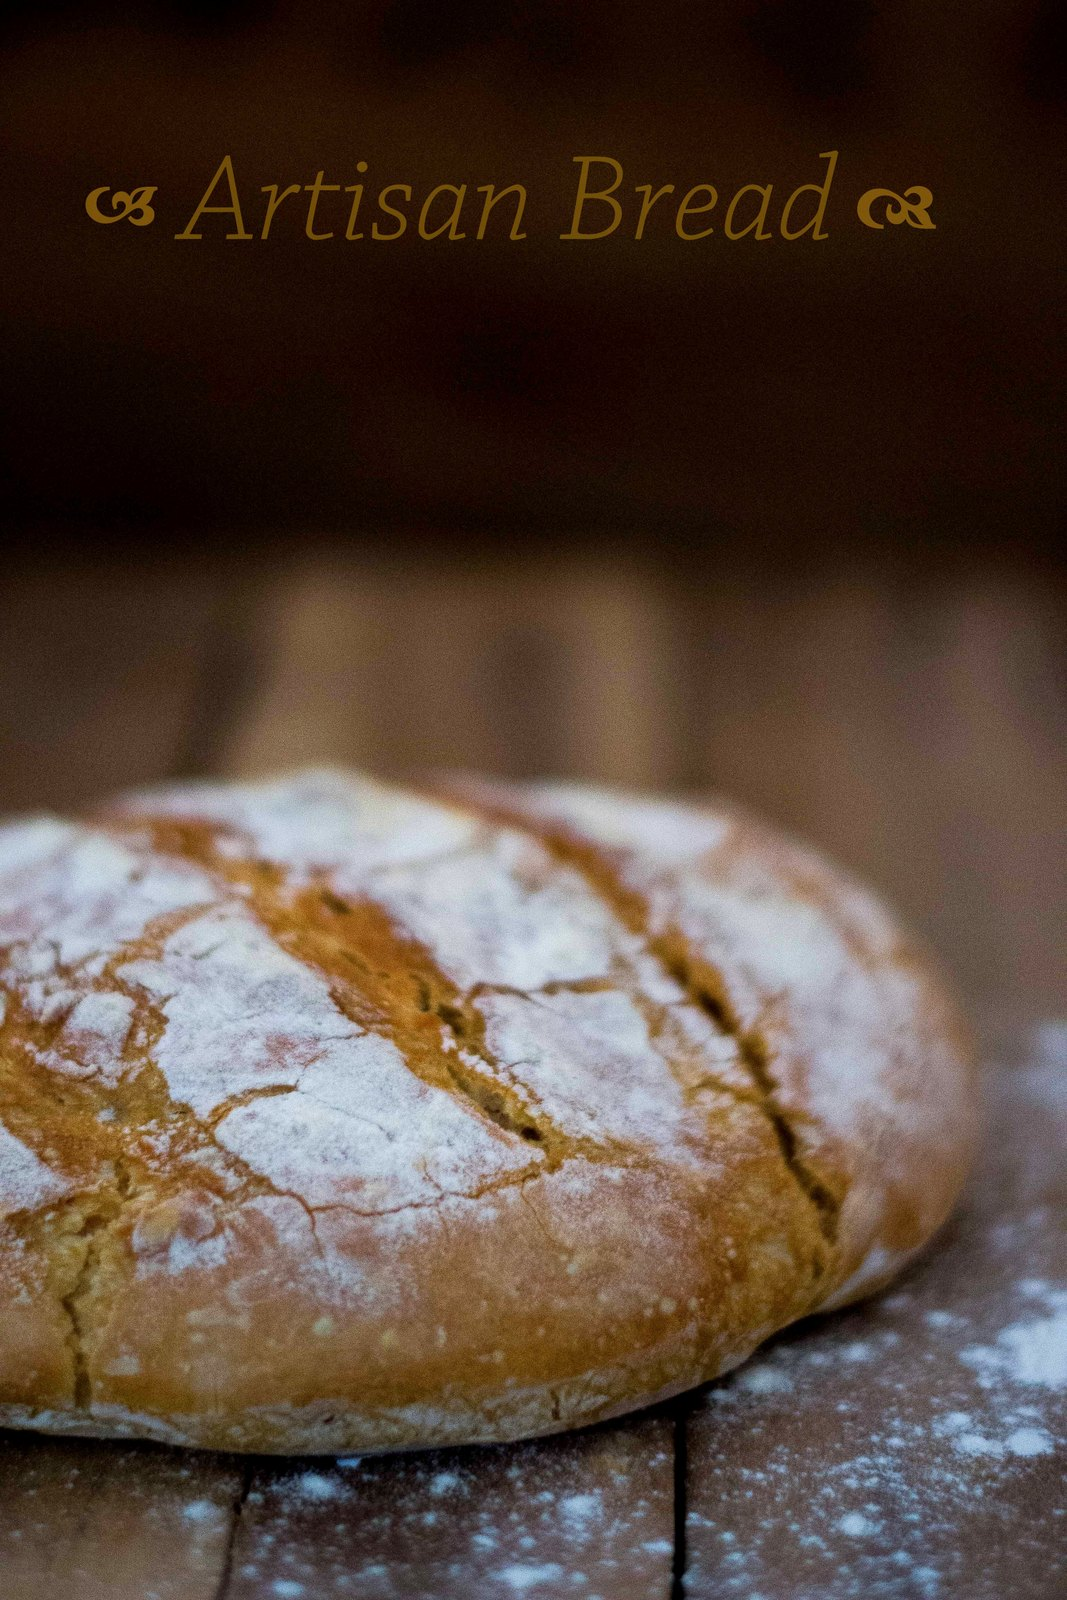 No Knead Crusty Artisan Bread - The White Ramekins